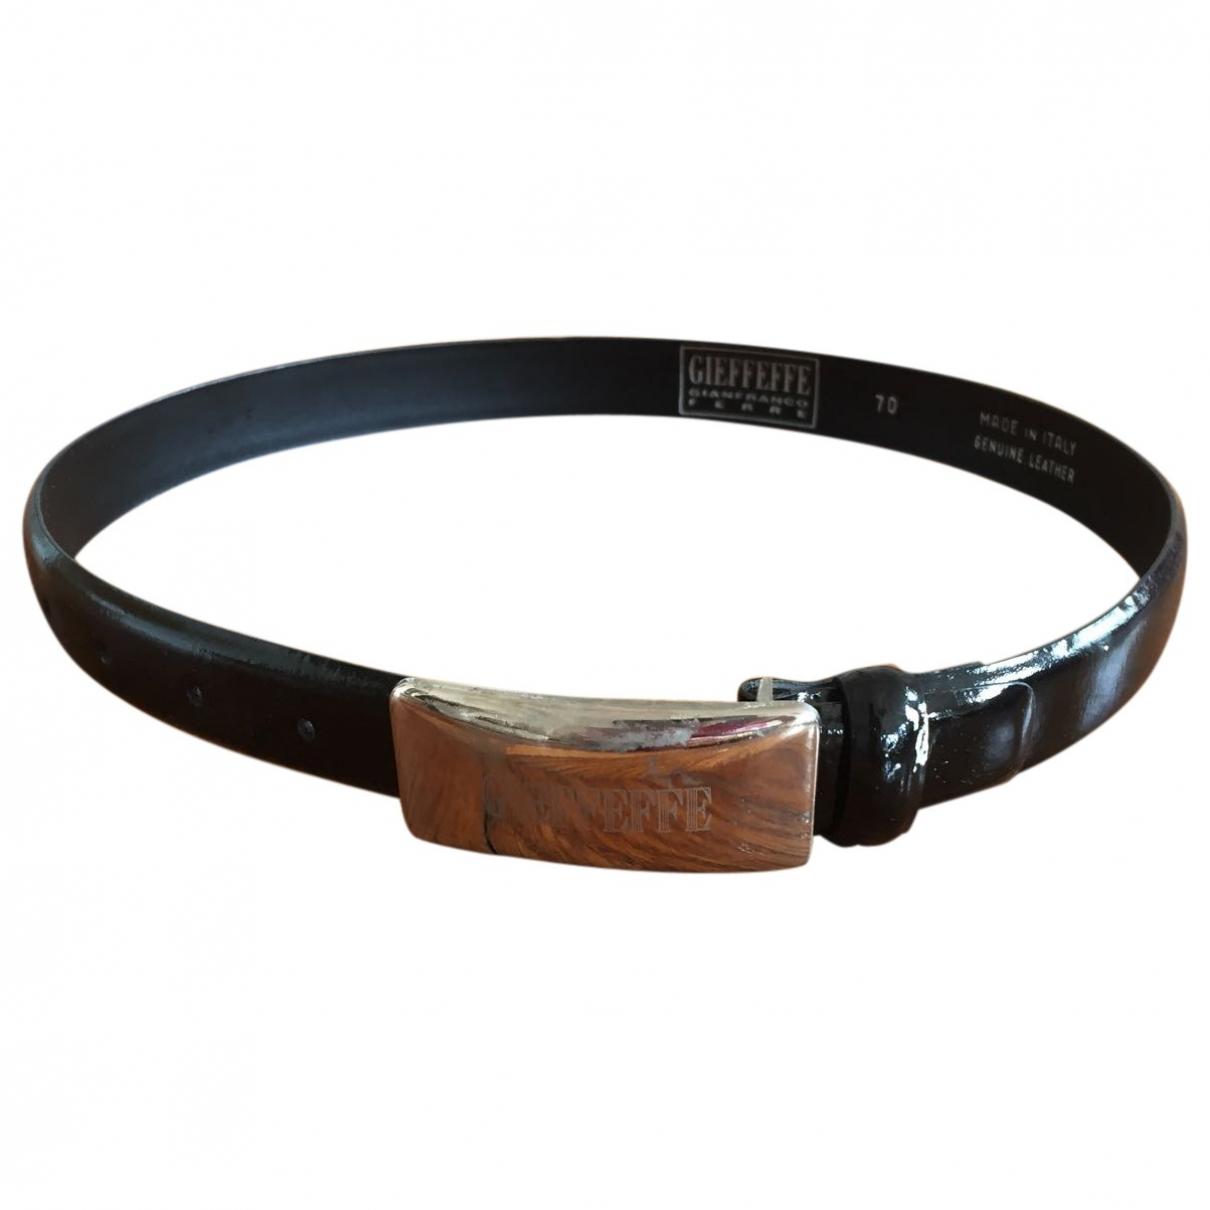 Gianfranco Ferré \N Black Patent leather belt for Women 70 cm